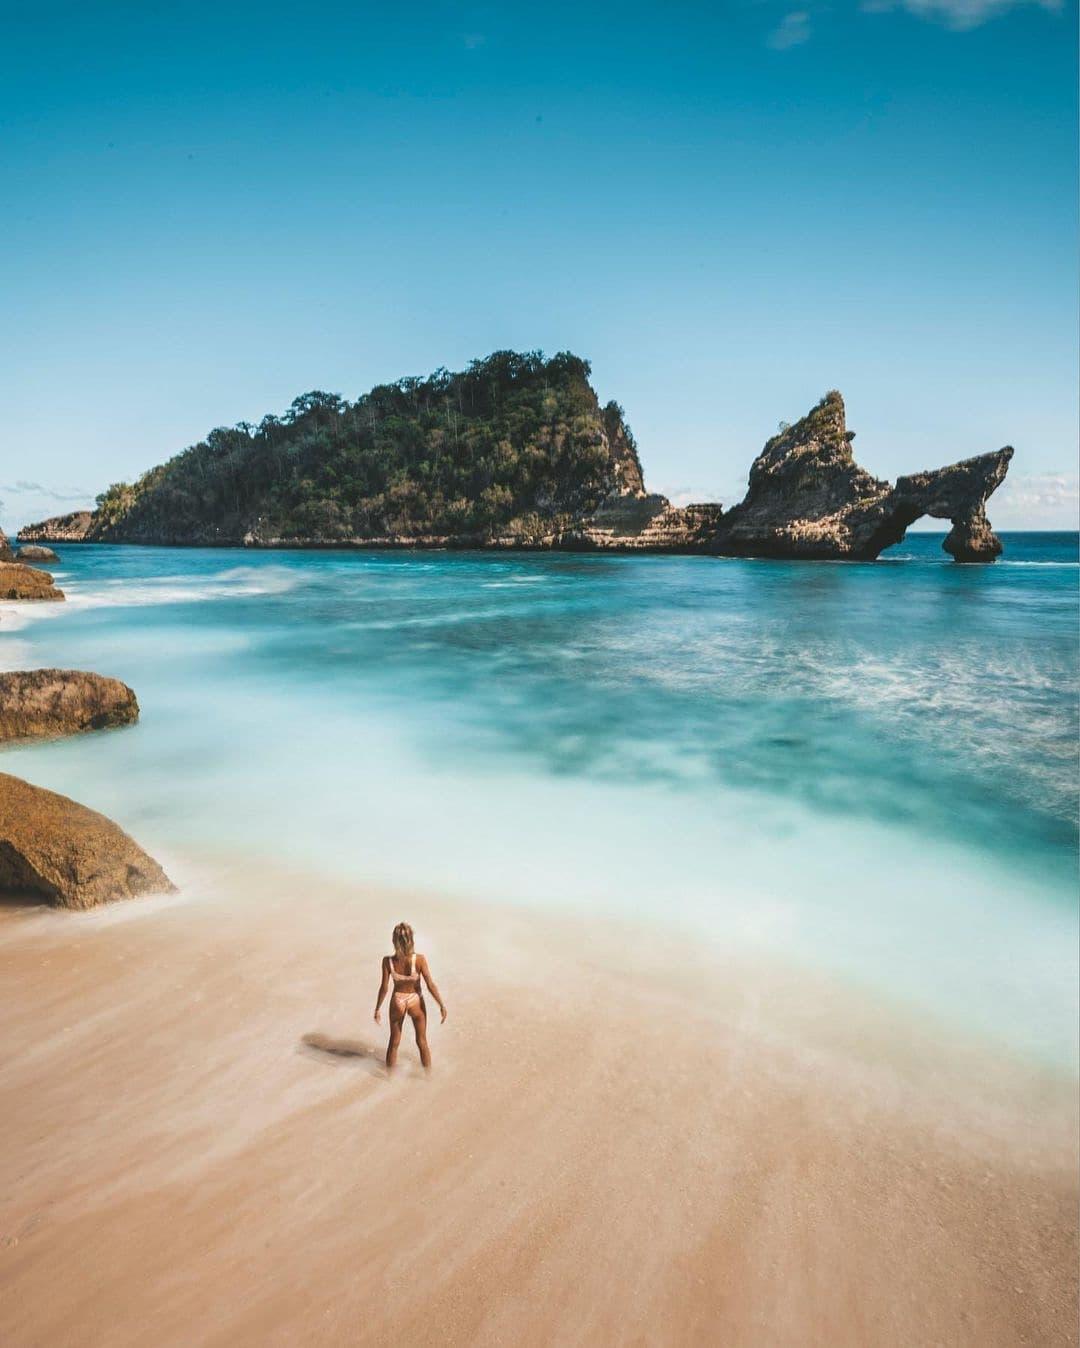 Atuh Beach Nusapenida Image From @christianals